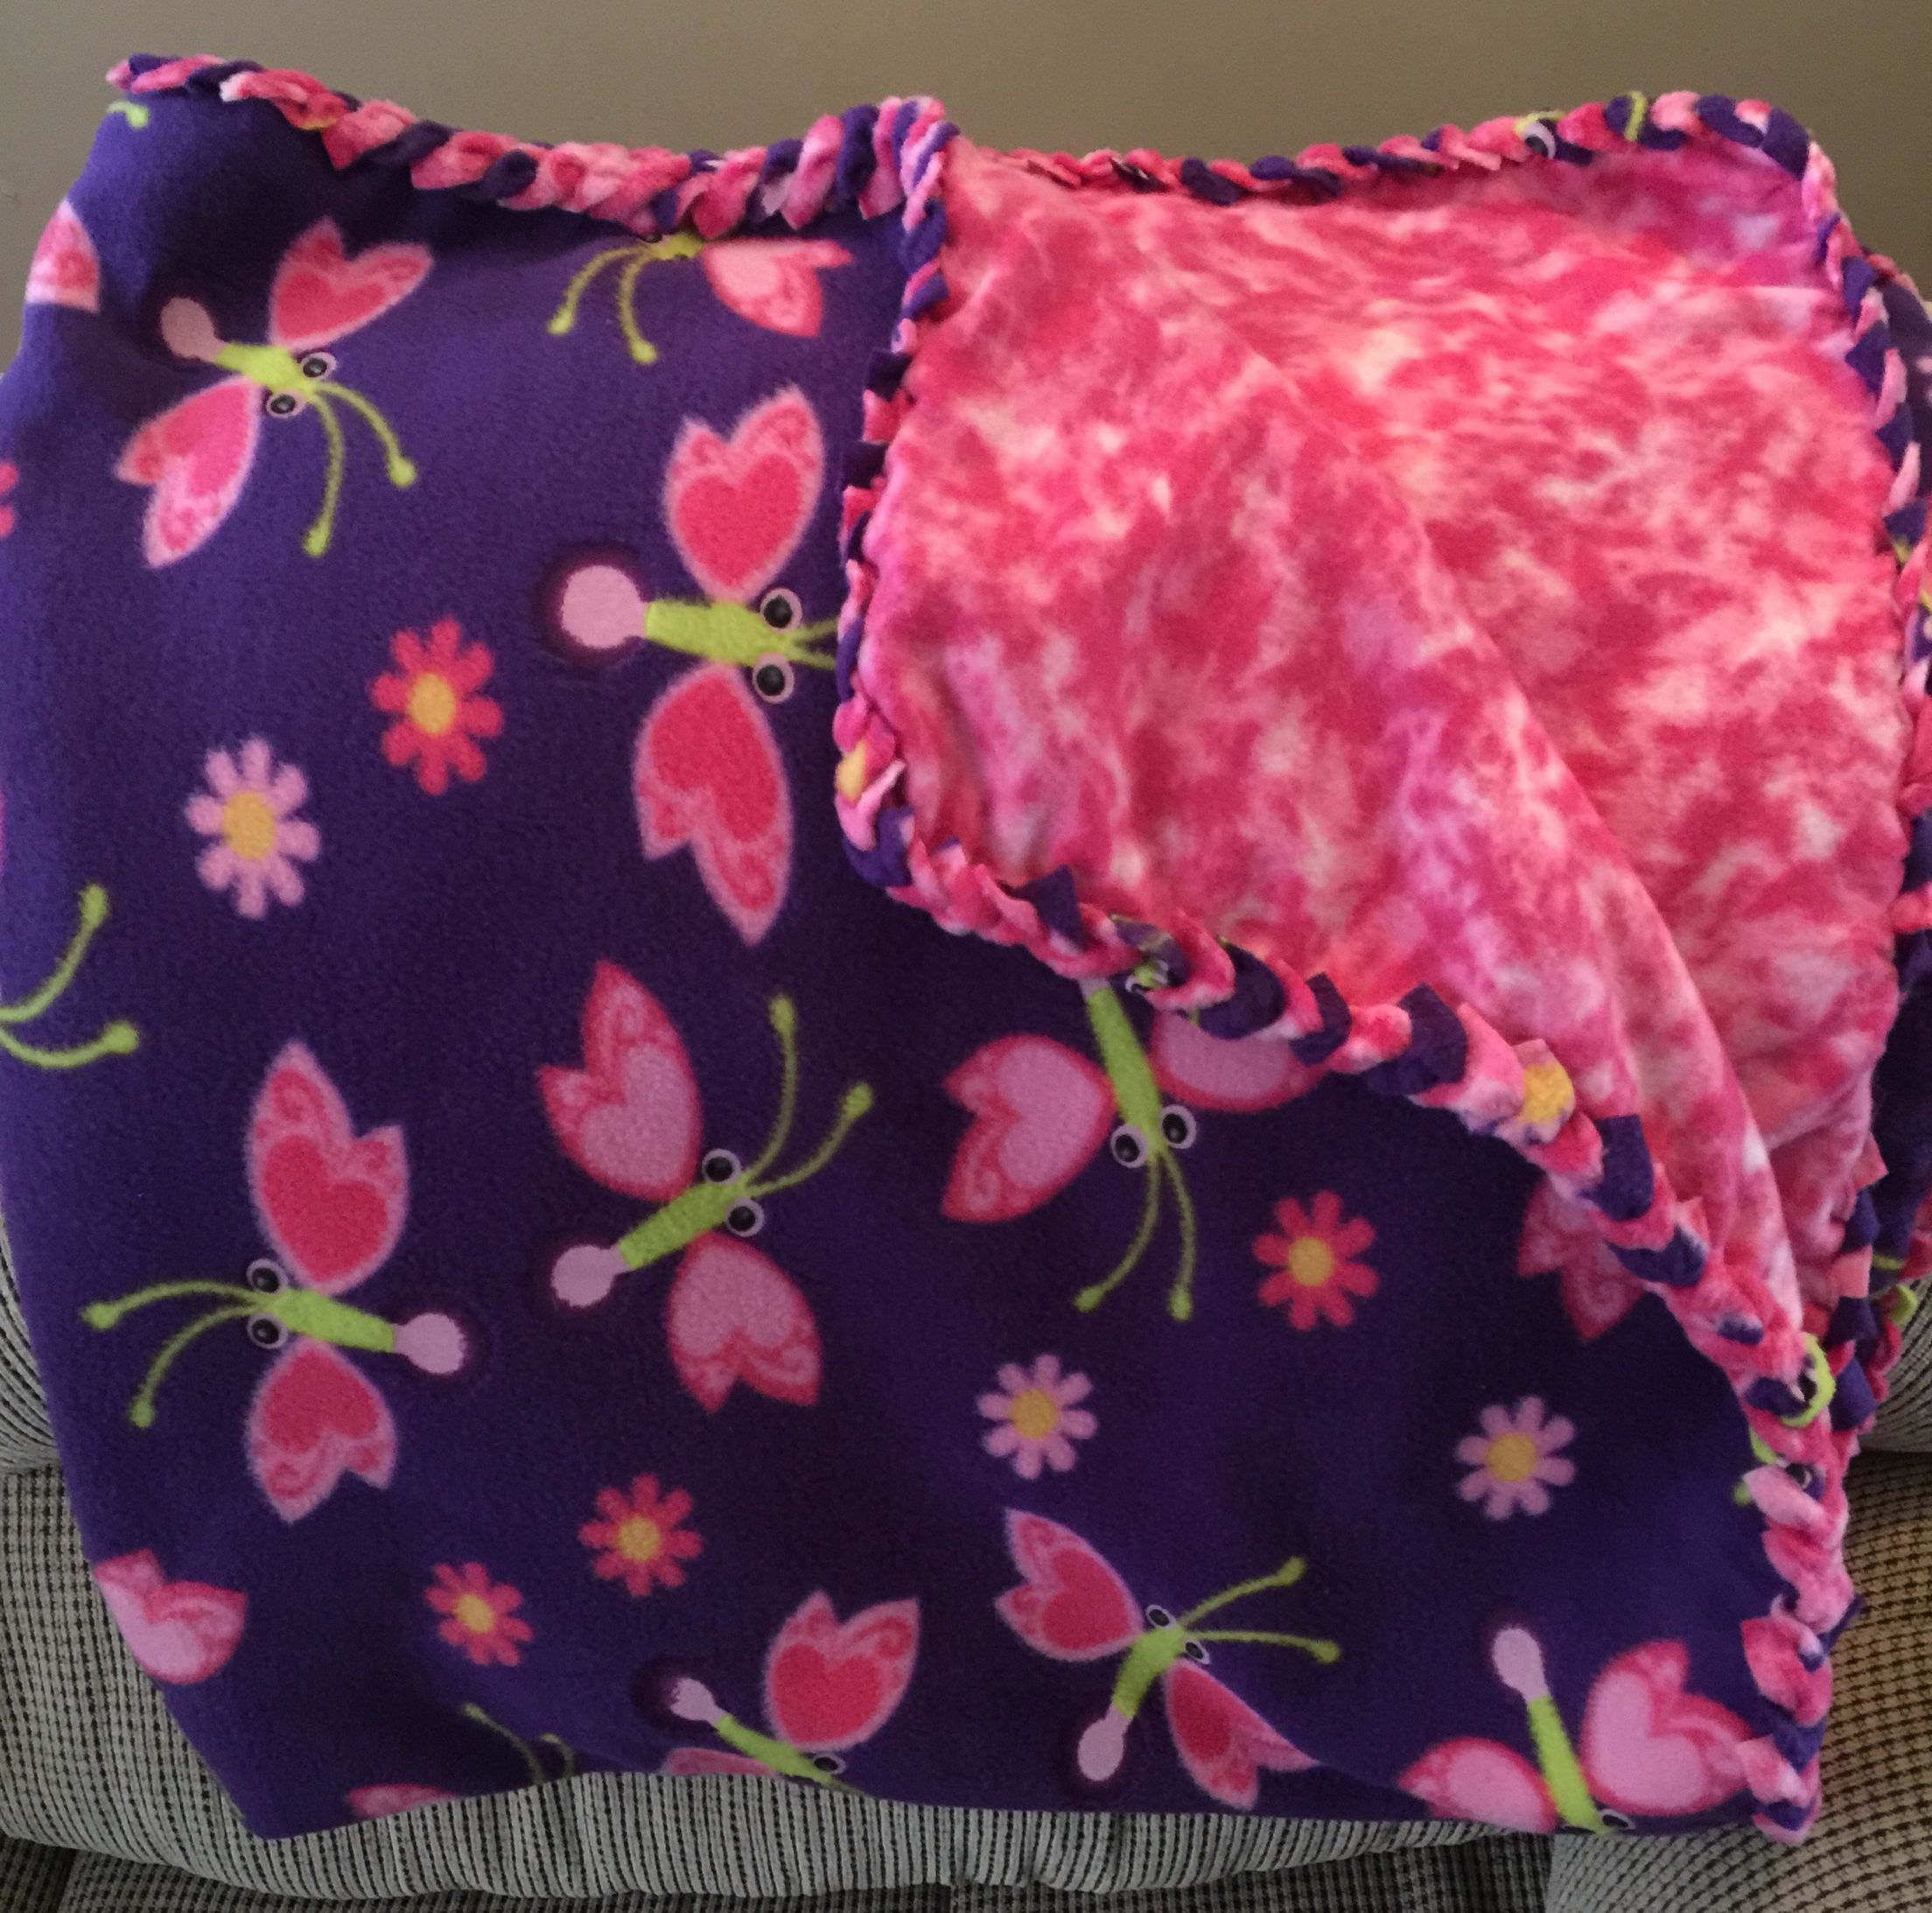 #Purple #Pink #butterflies #fleece #blanket  December 2014  Twin Bed Size $45 + shipping Email: candyce.sindelir@gmail.com